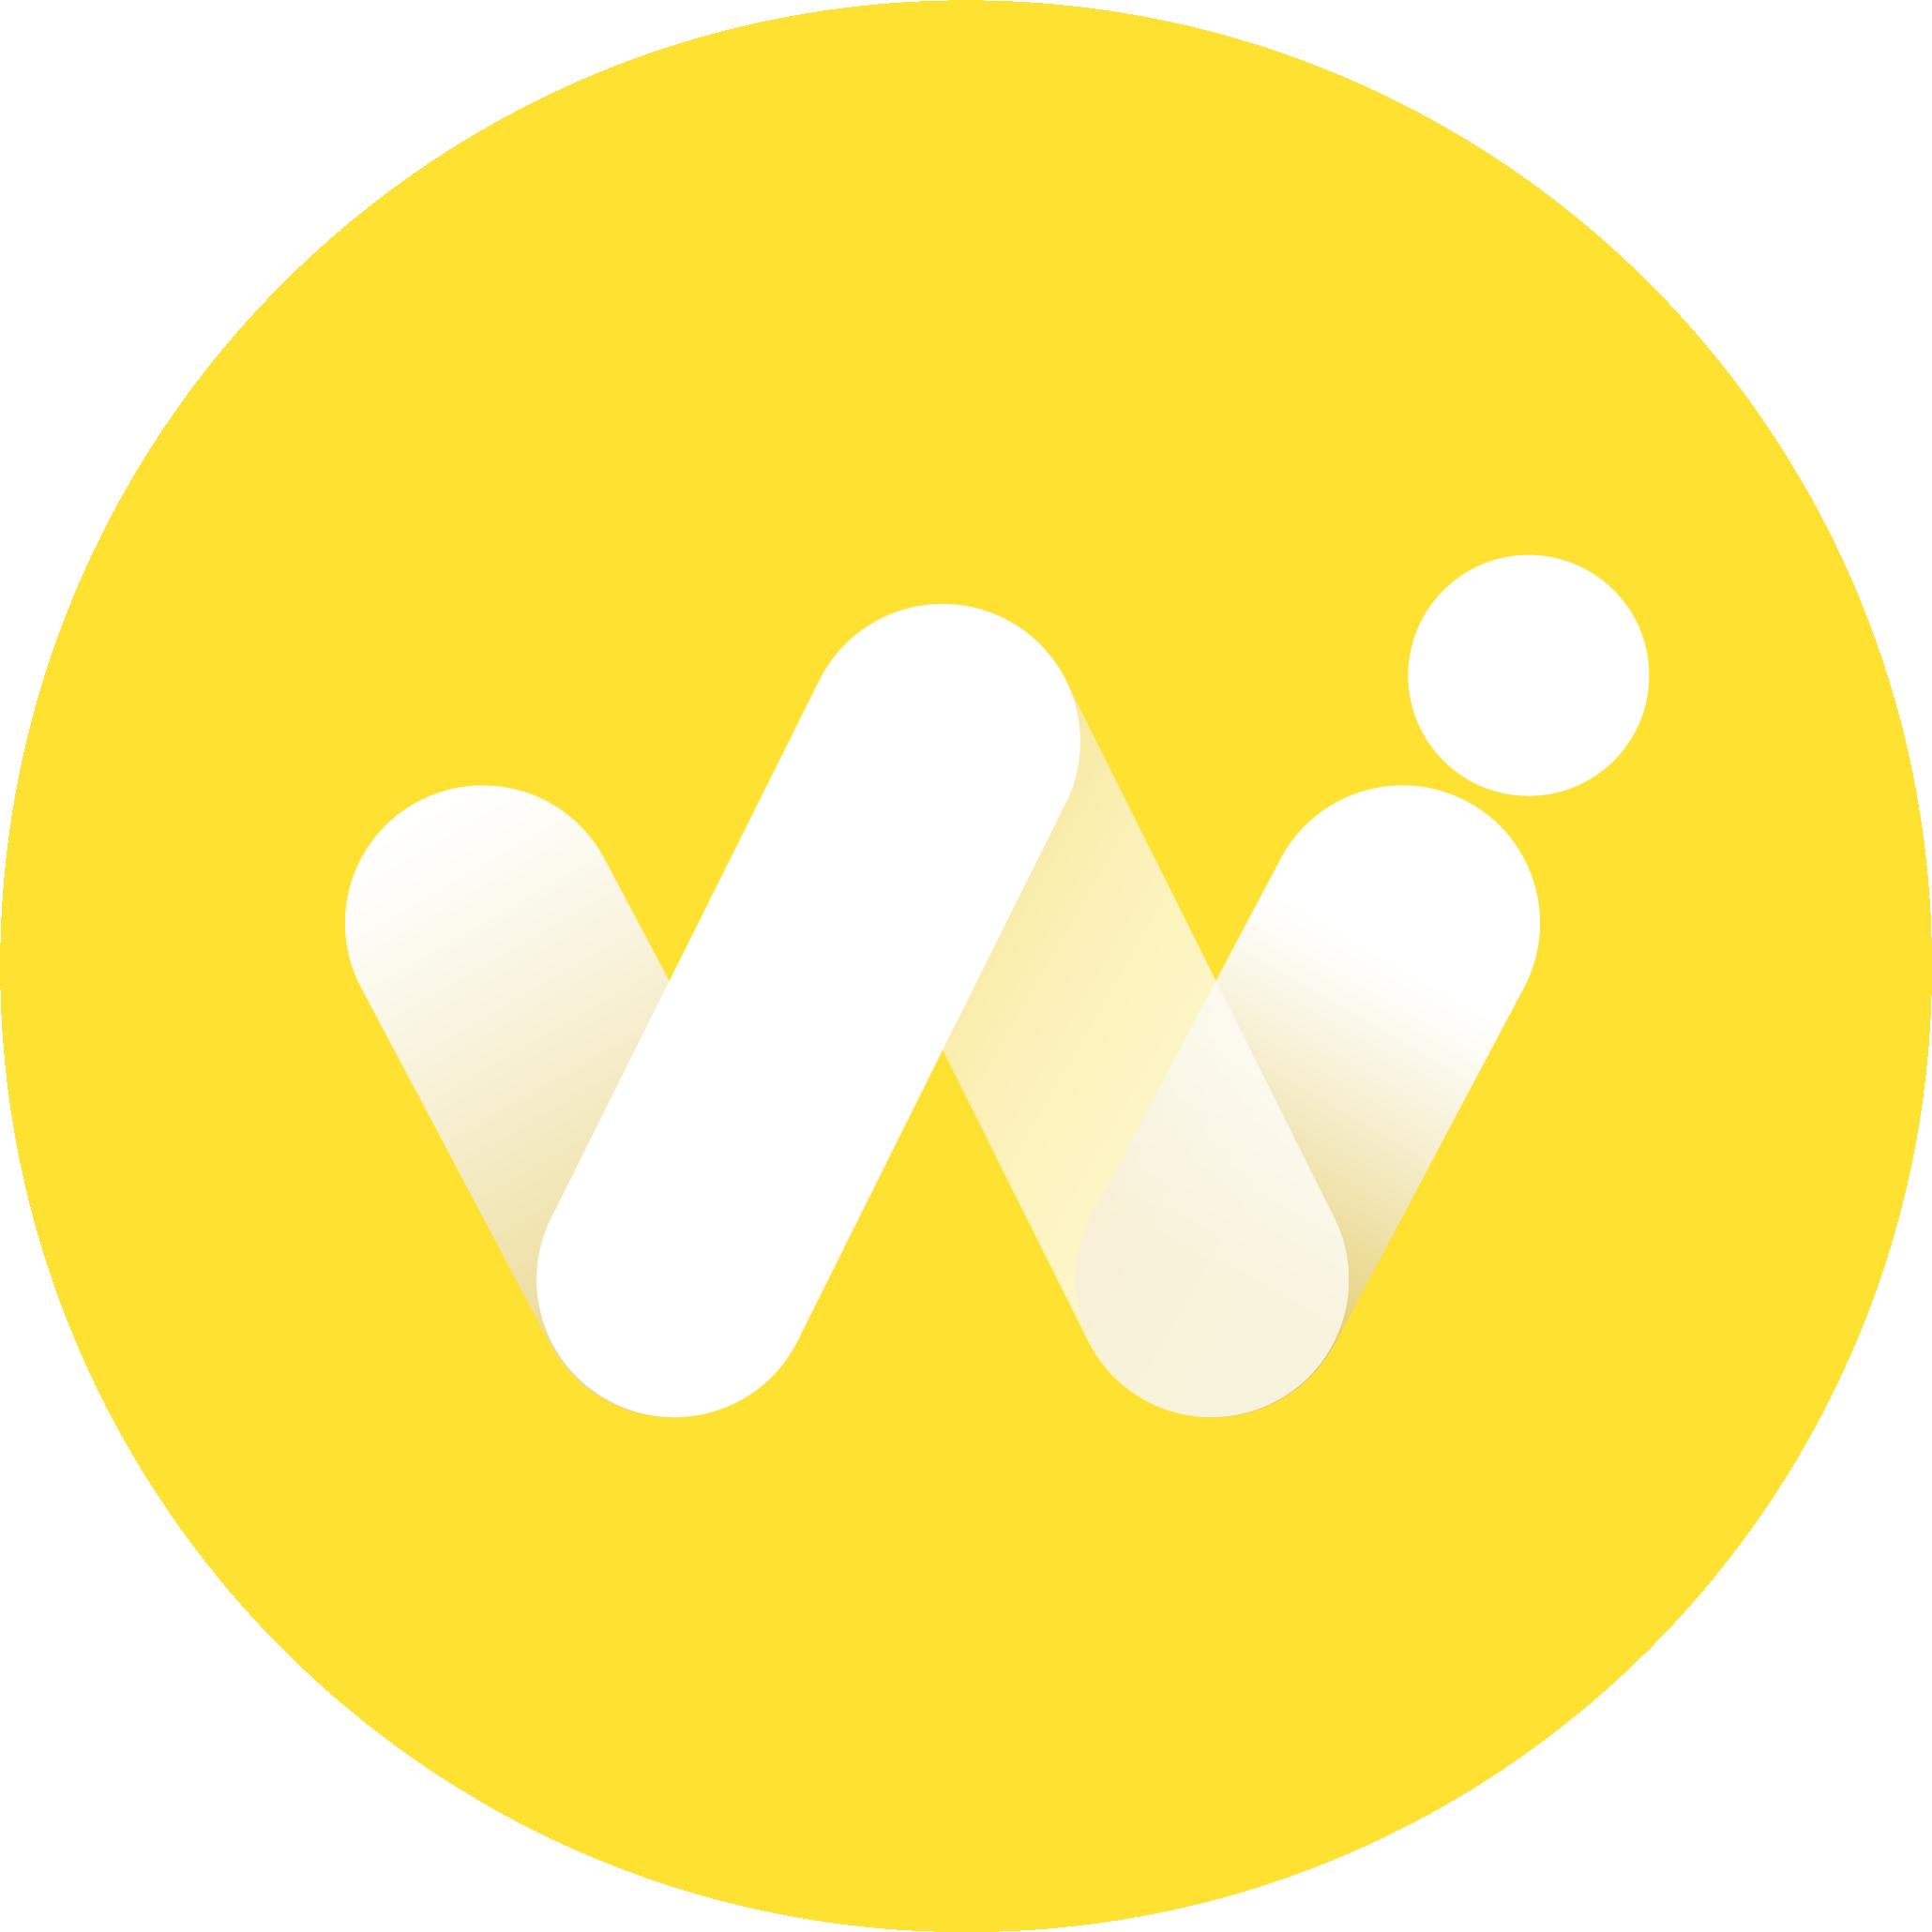 Logo wifly amarillo circular